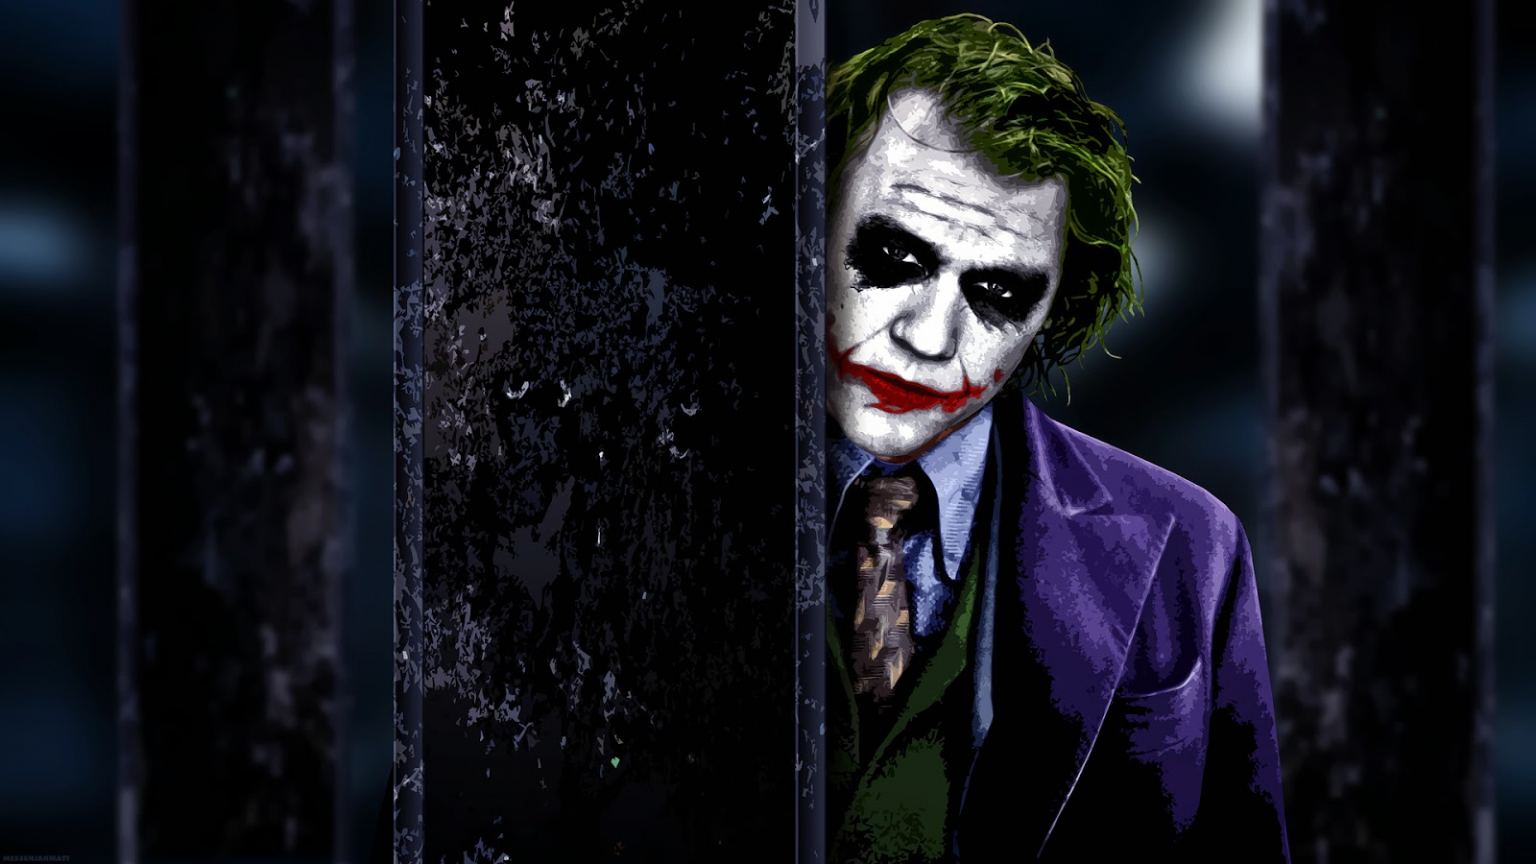 Free Download Joker HD Wallpapers Joker Backgrounds Widescreen